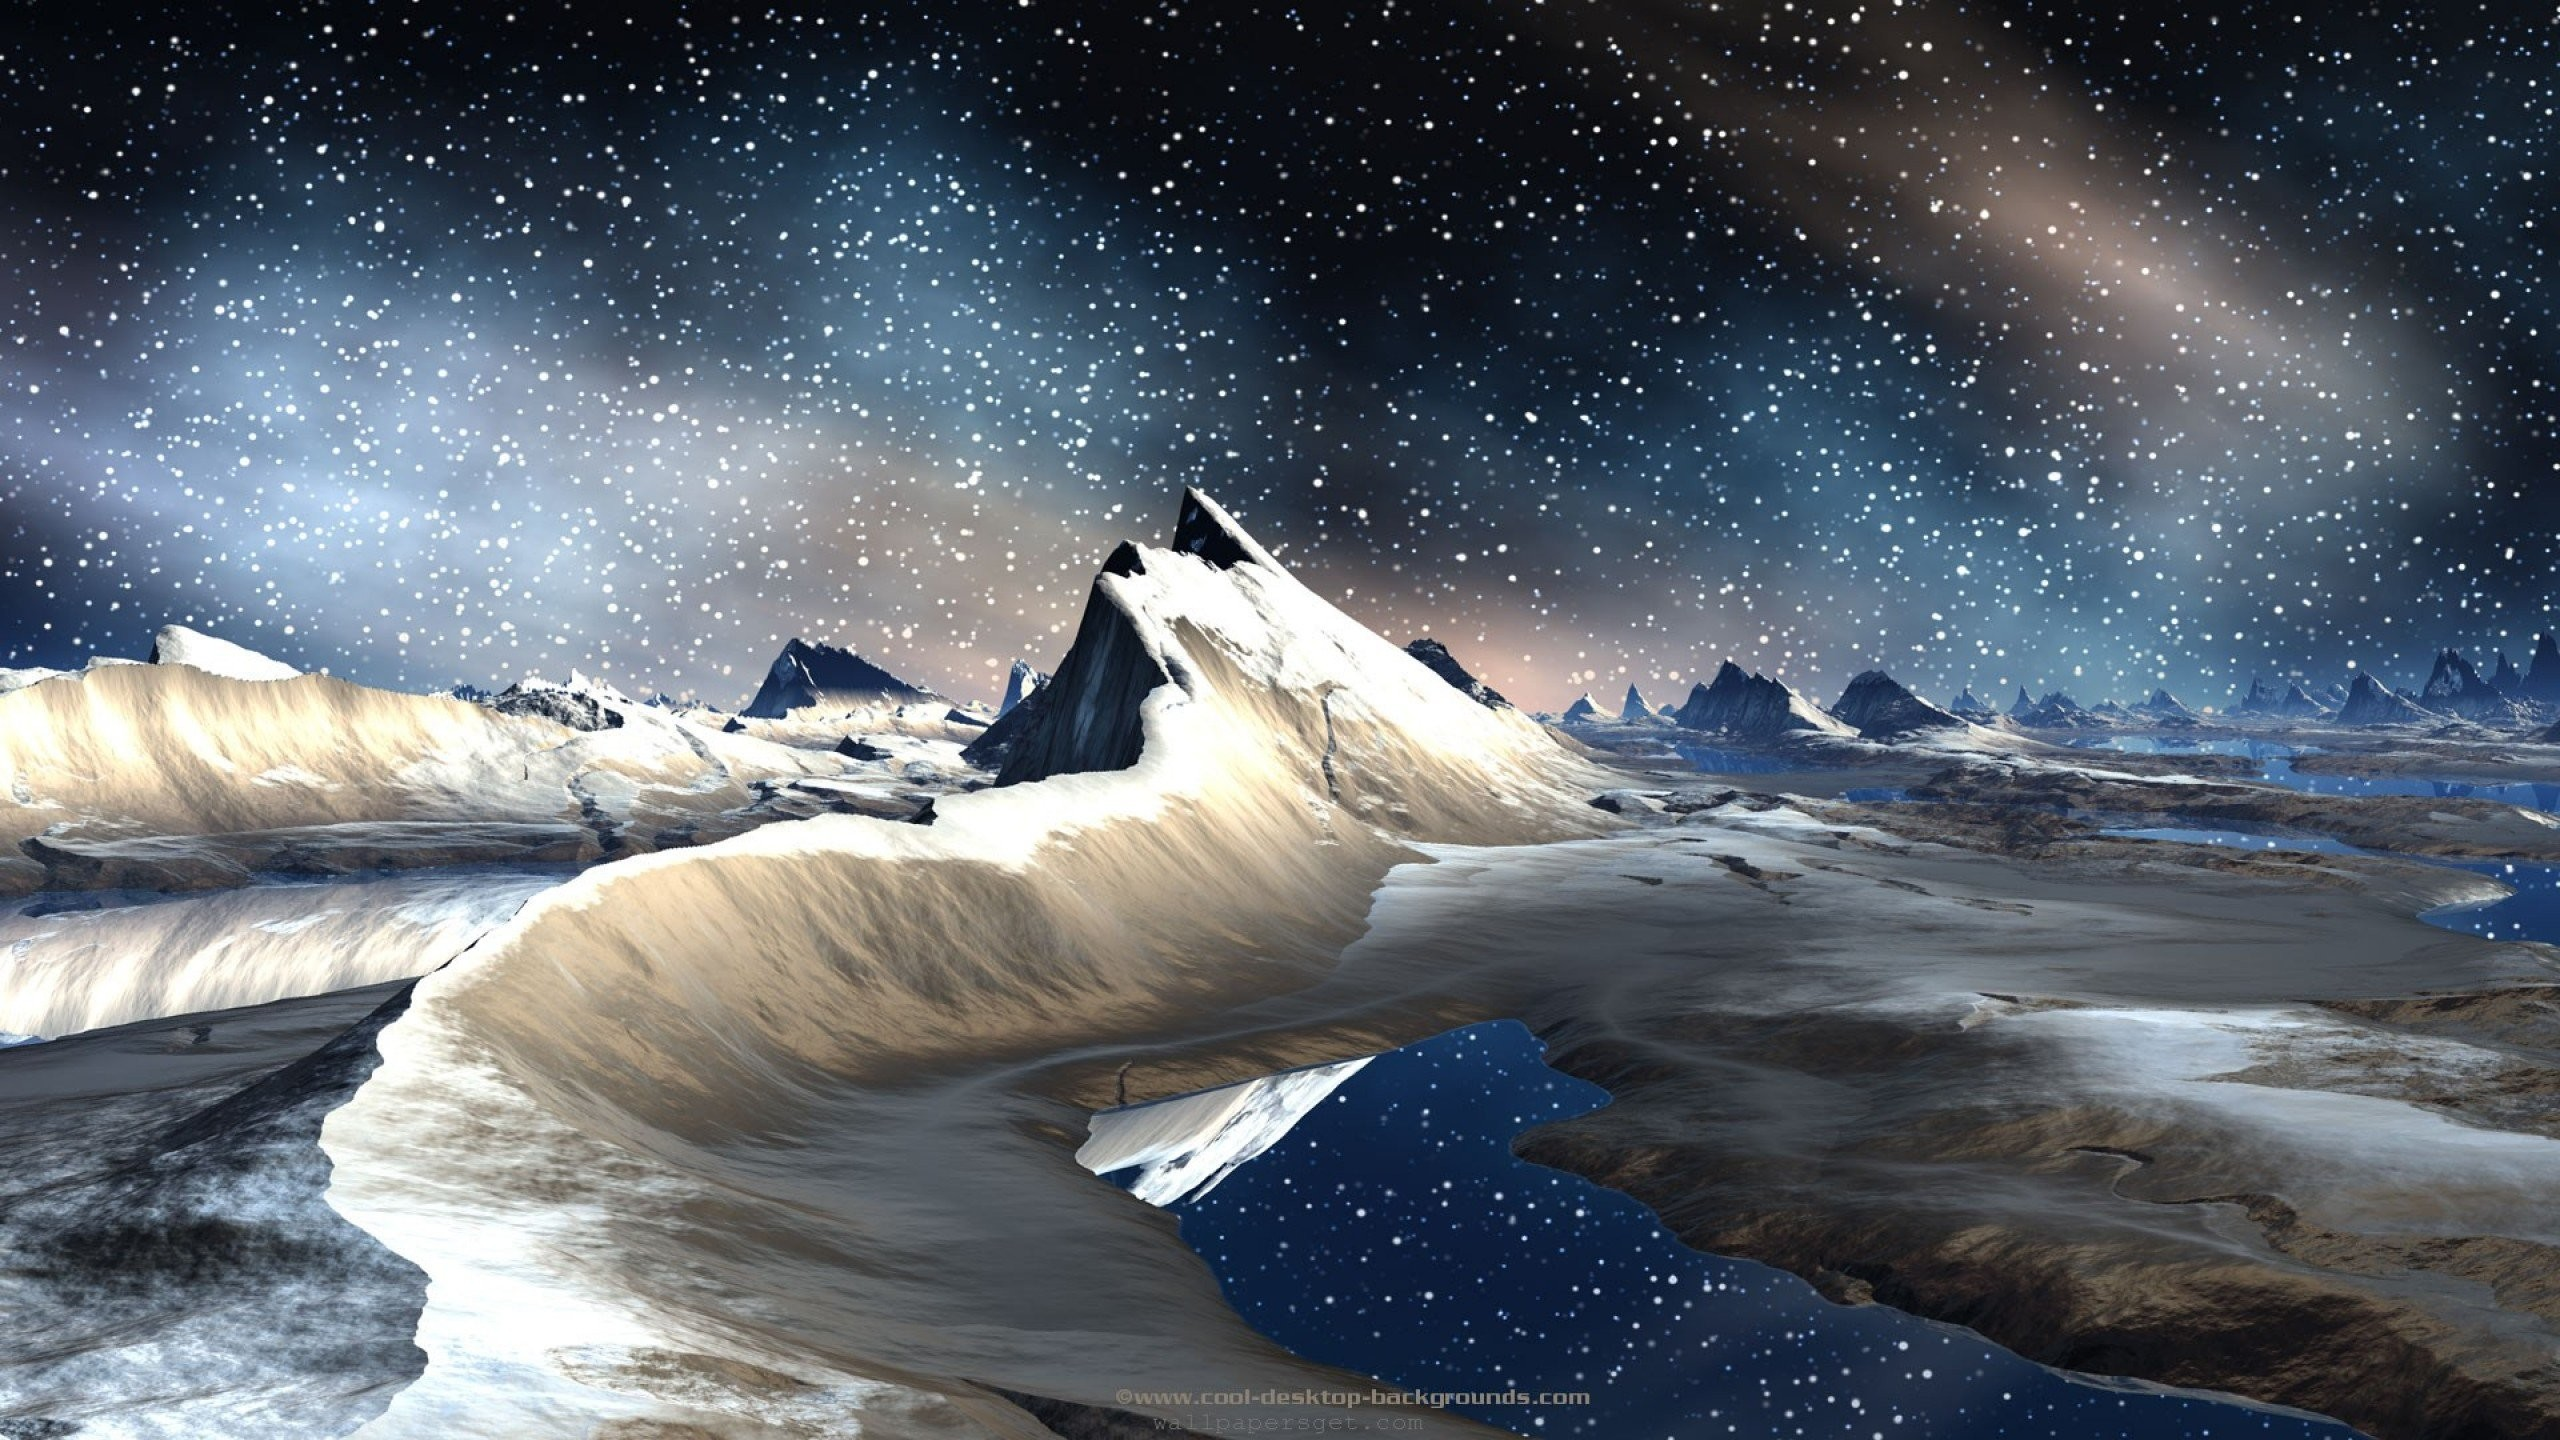 Space Desktop Backgrounds 731447